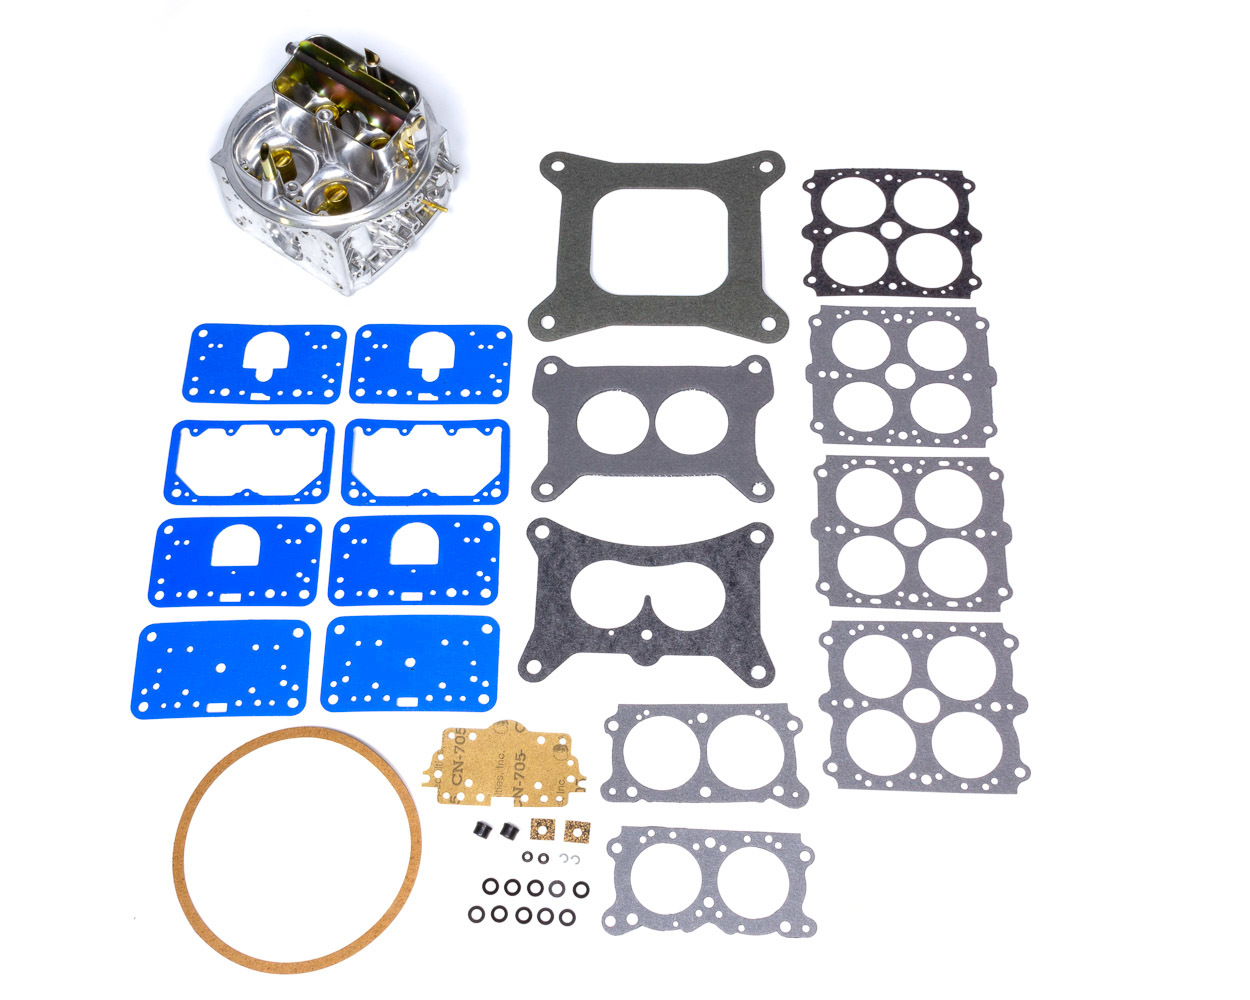 Holley 134-353 Carburetor Main Body, Replacement, 770 CFM, Aluminum, Silver, Holley Street Avenger Model 4150 Carburetor, Kit